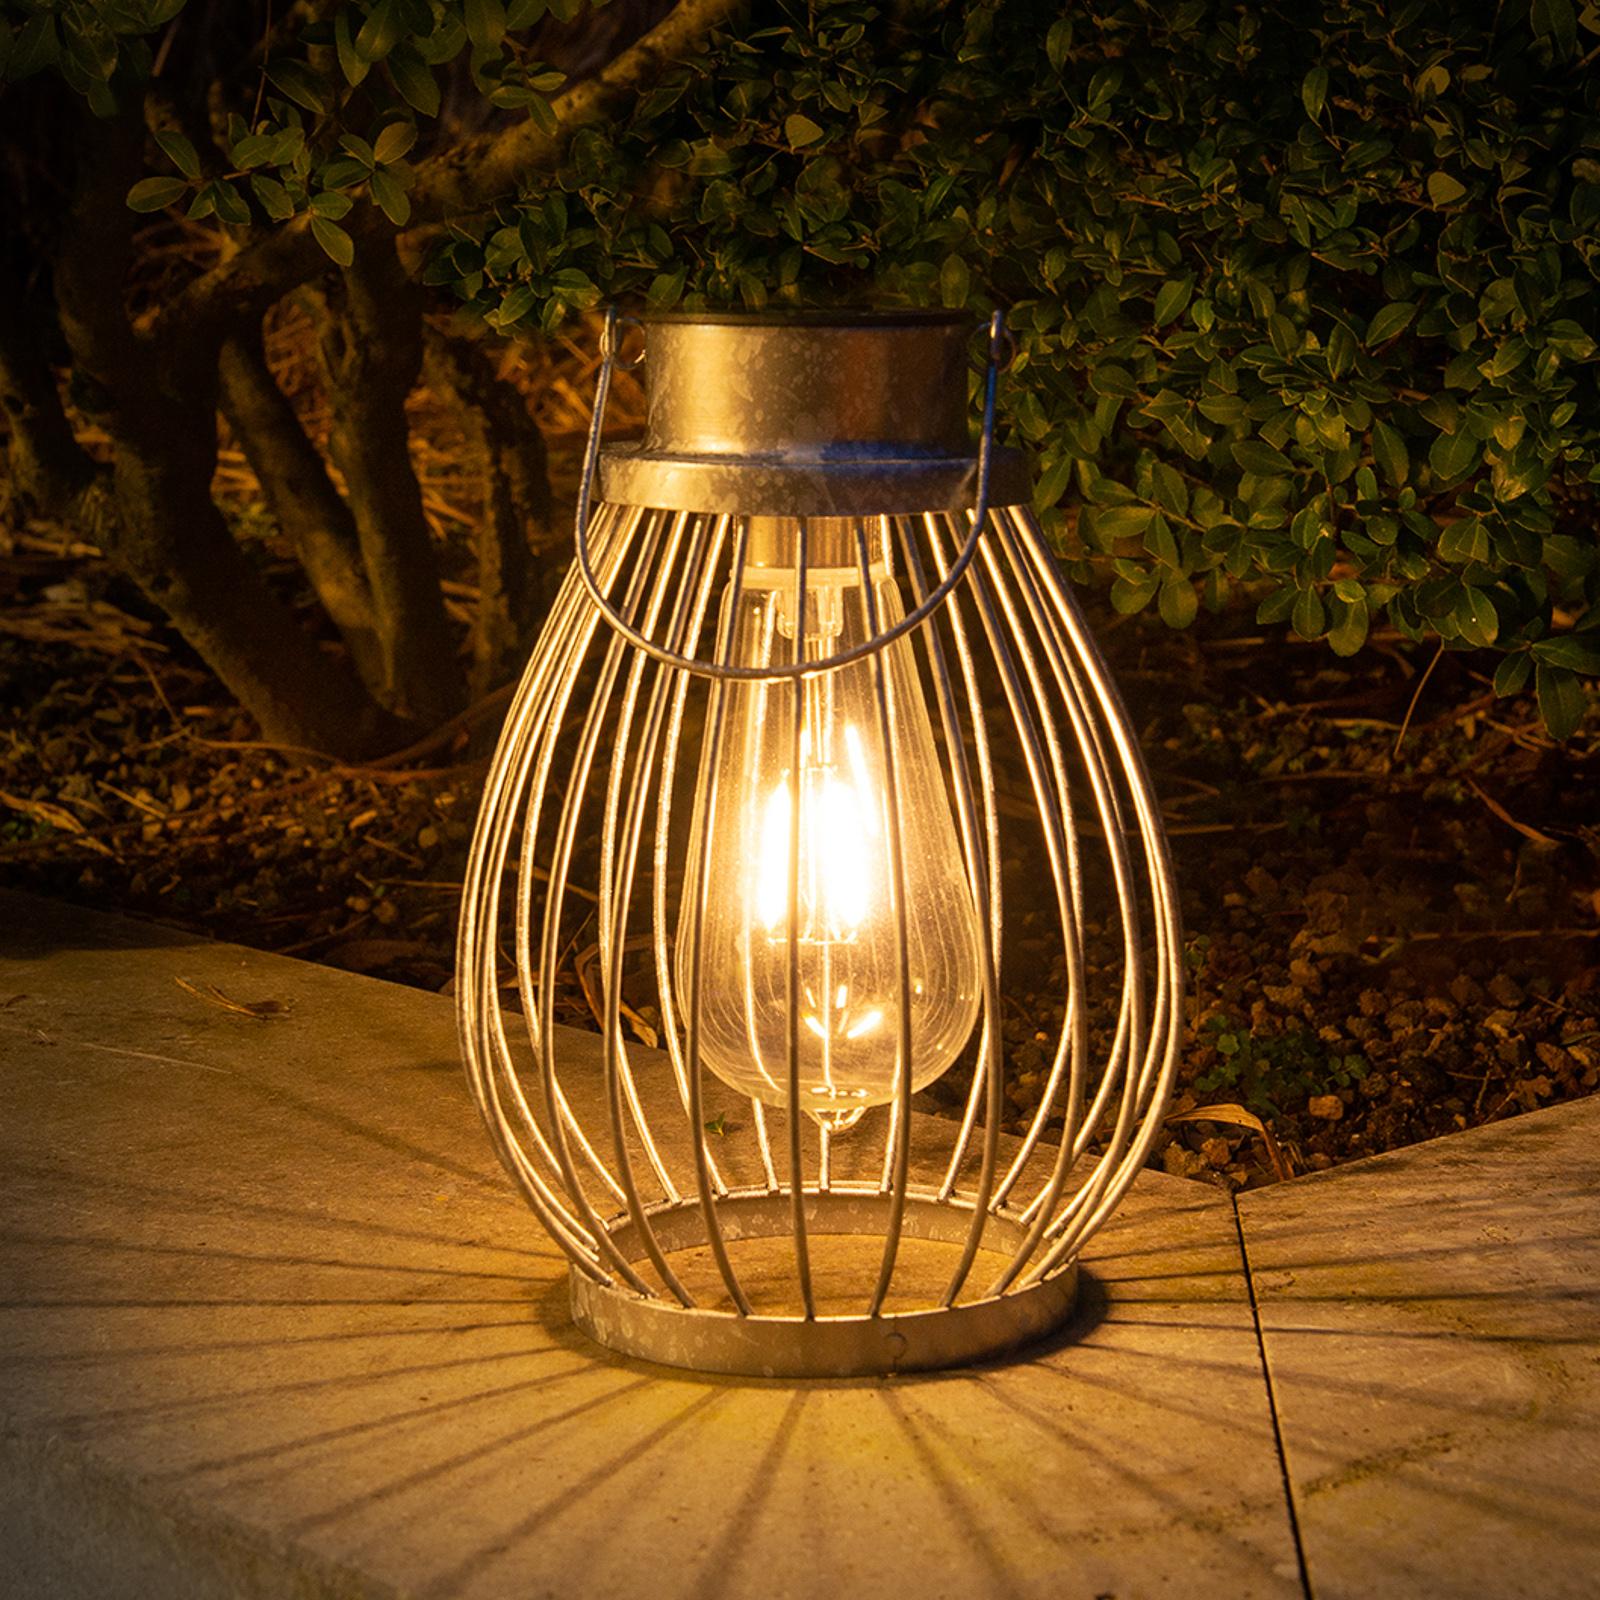 Soldriven dekorativ LED-lykta 5249859